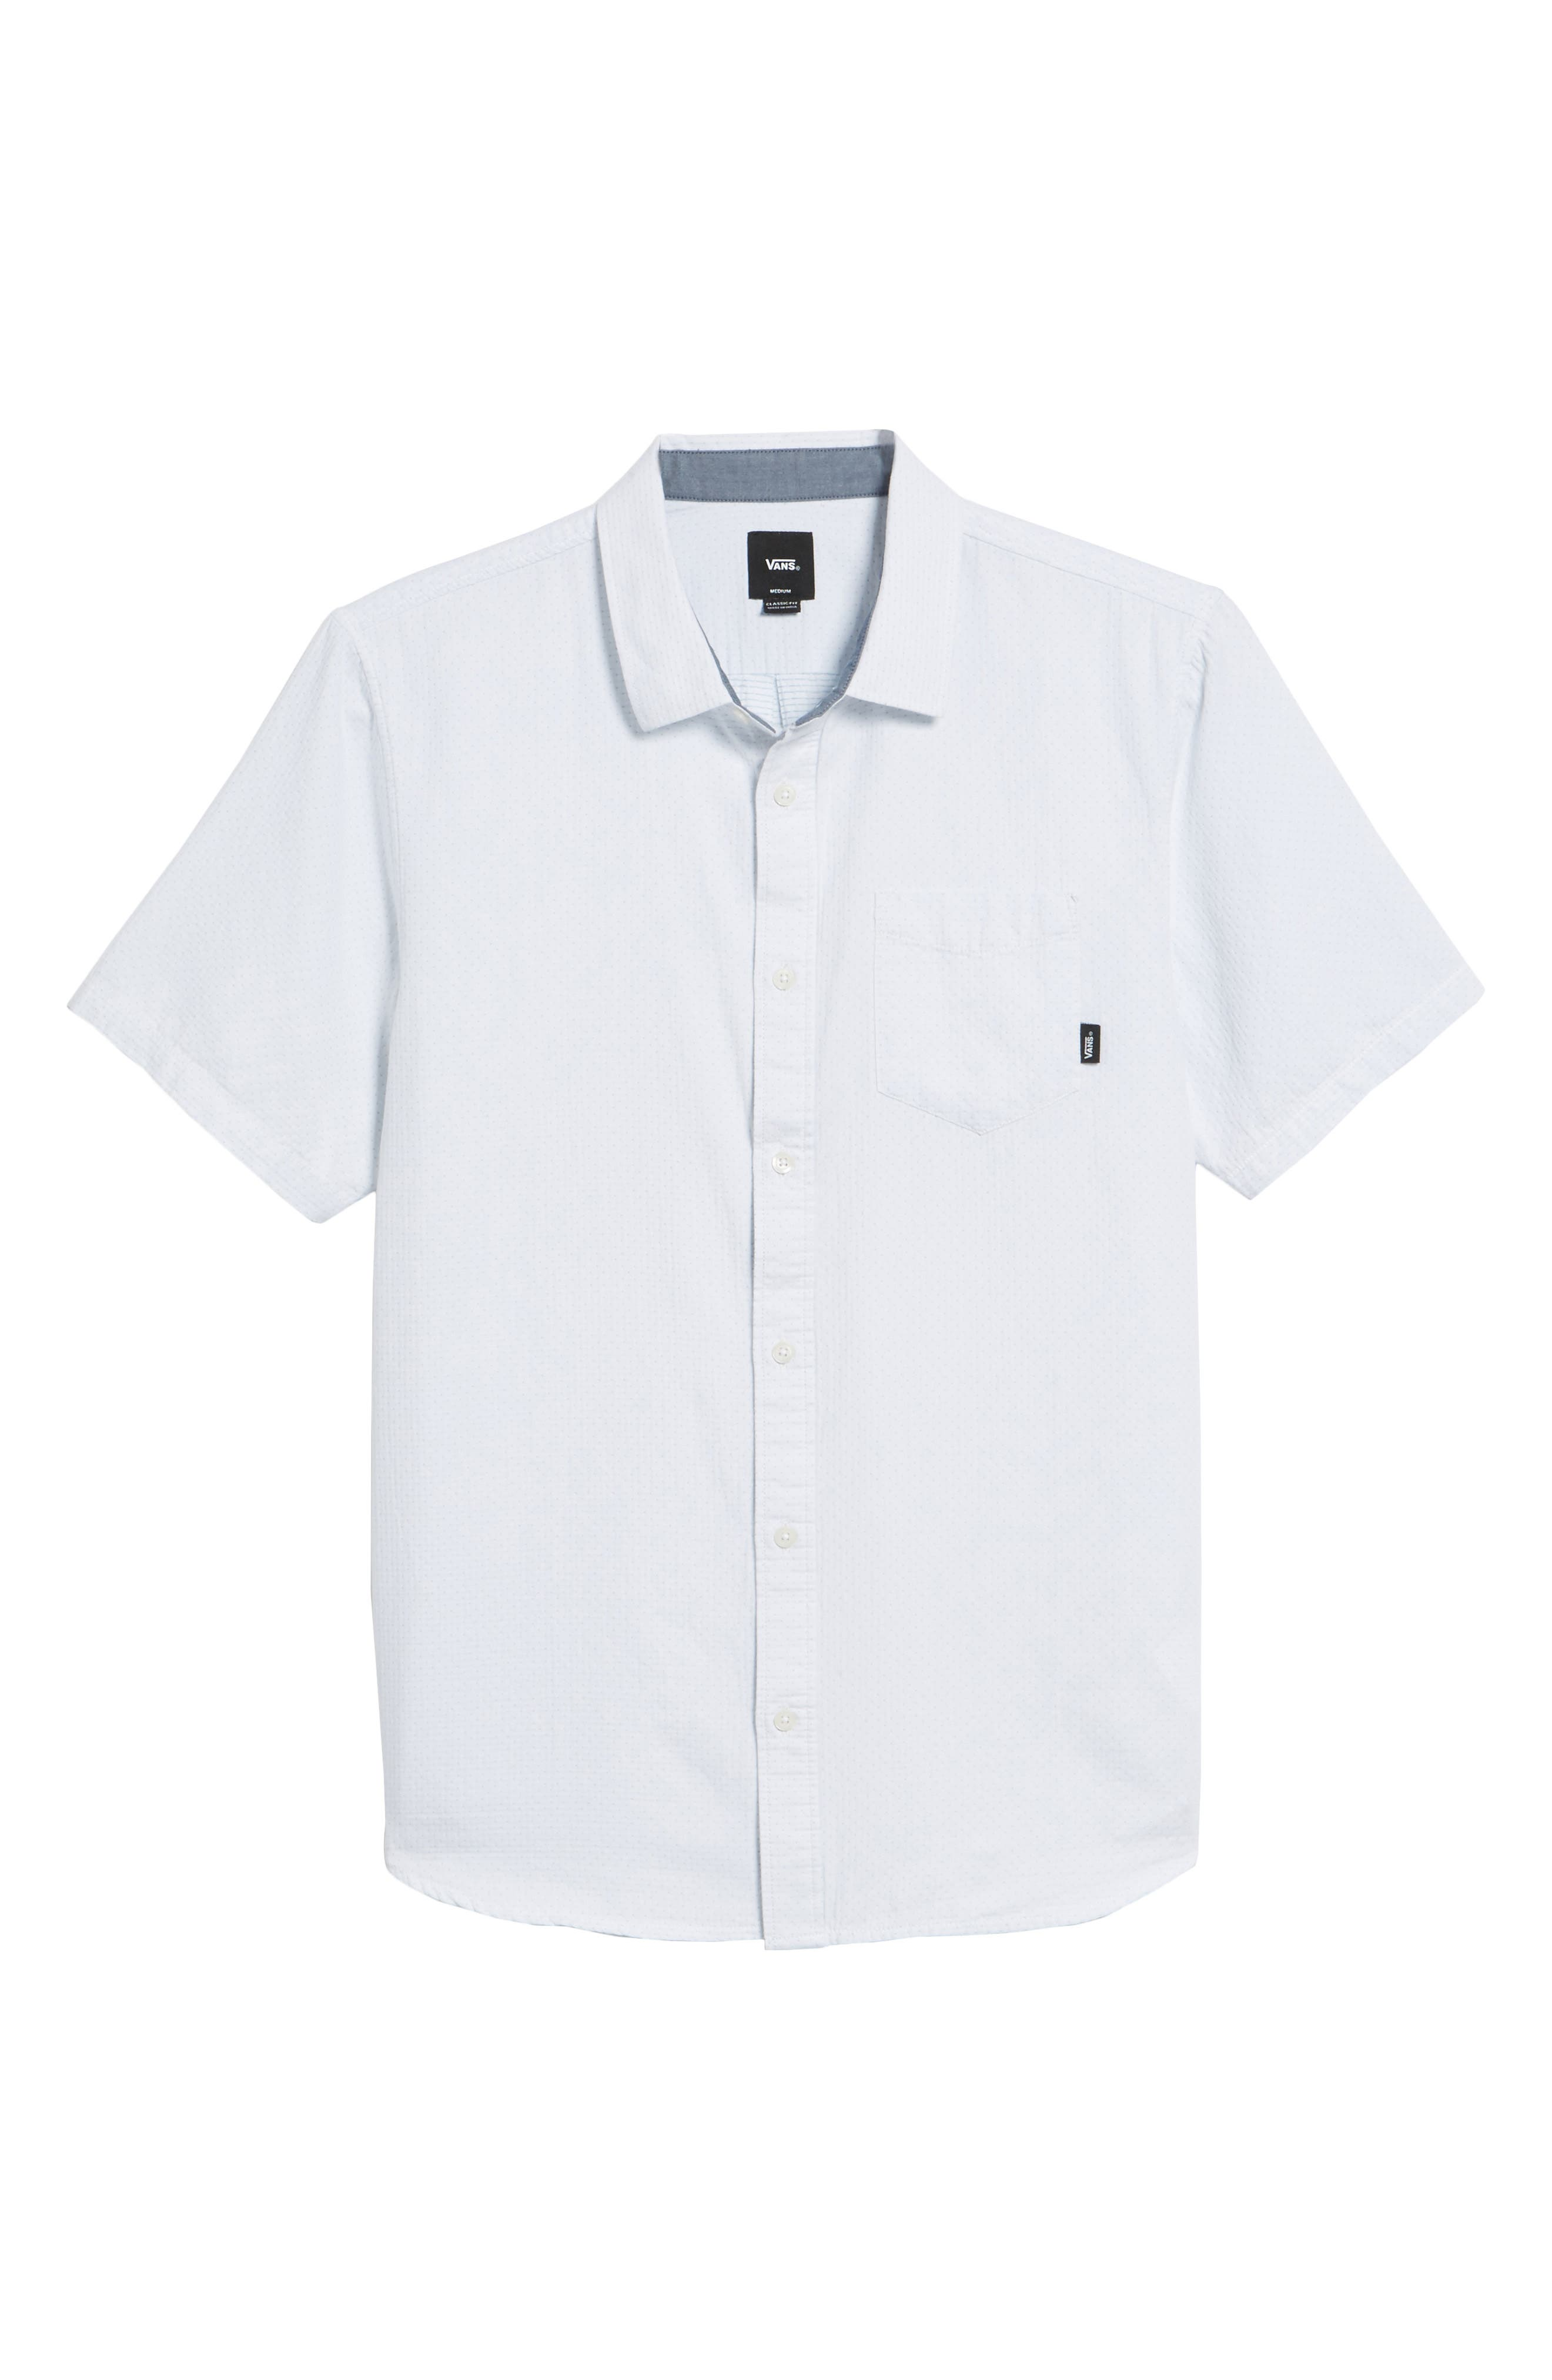 Fairdale Woven Shirt,                             Alternate thumbnail 6, color,                             White